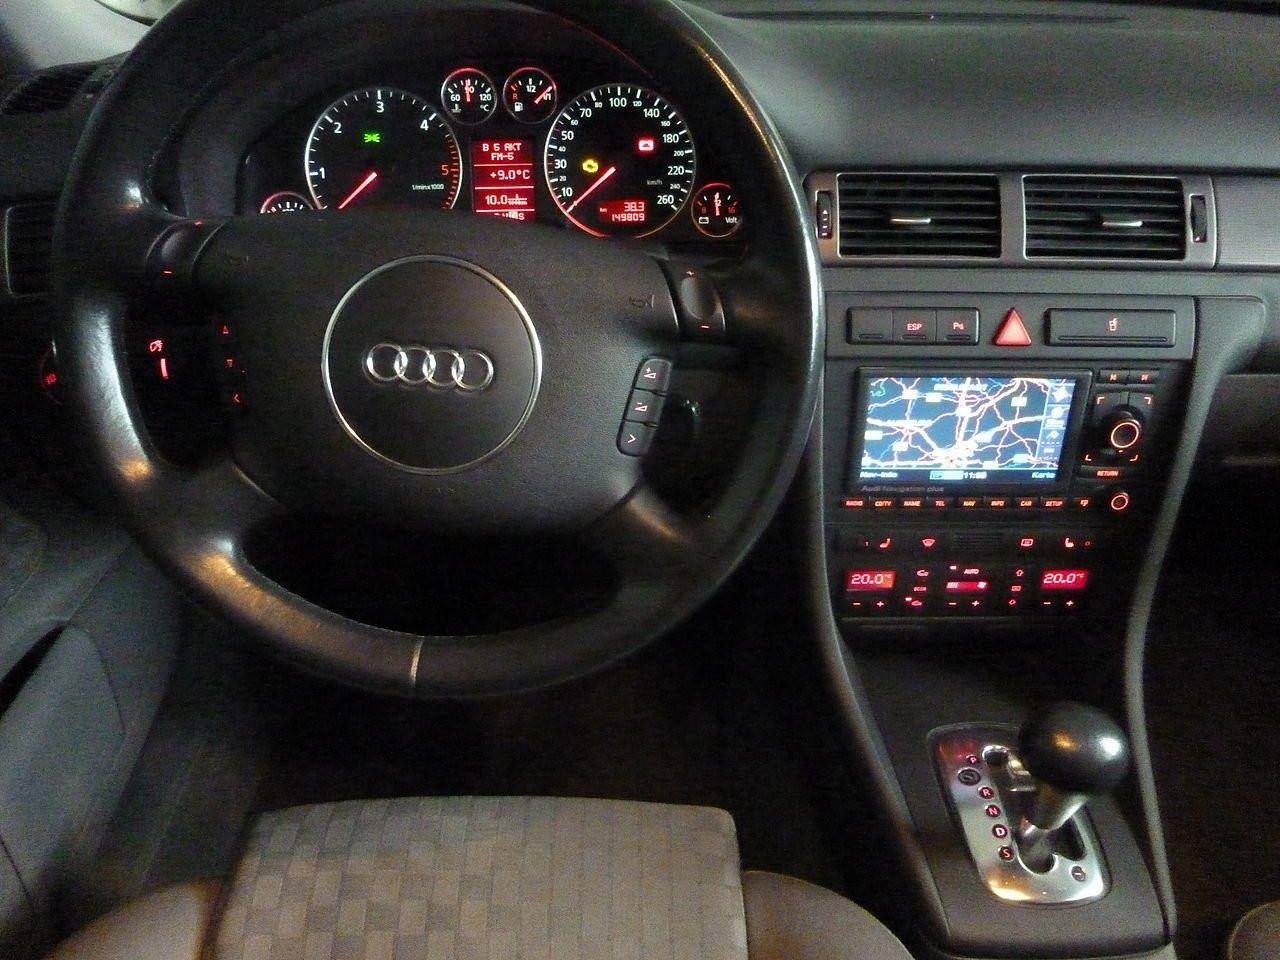 Kelebihan Audi A6 2004 Tangguh